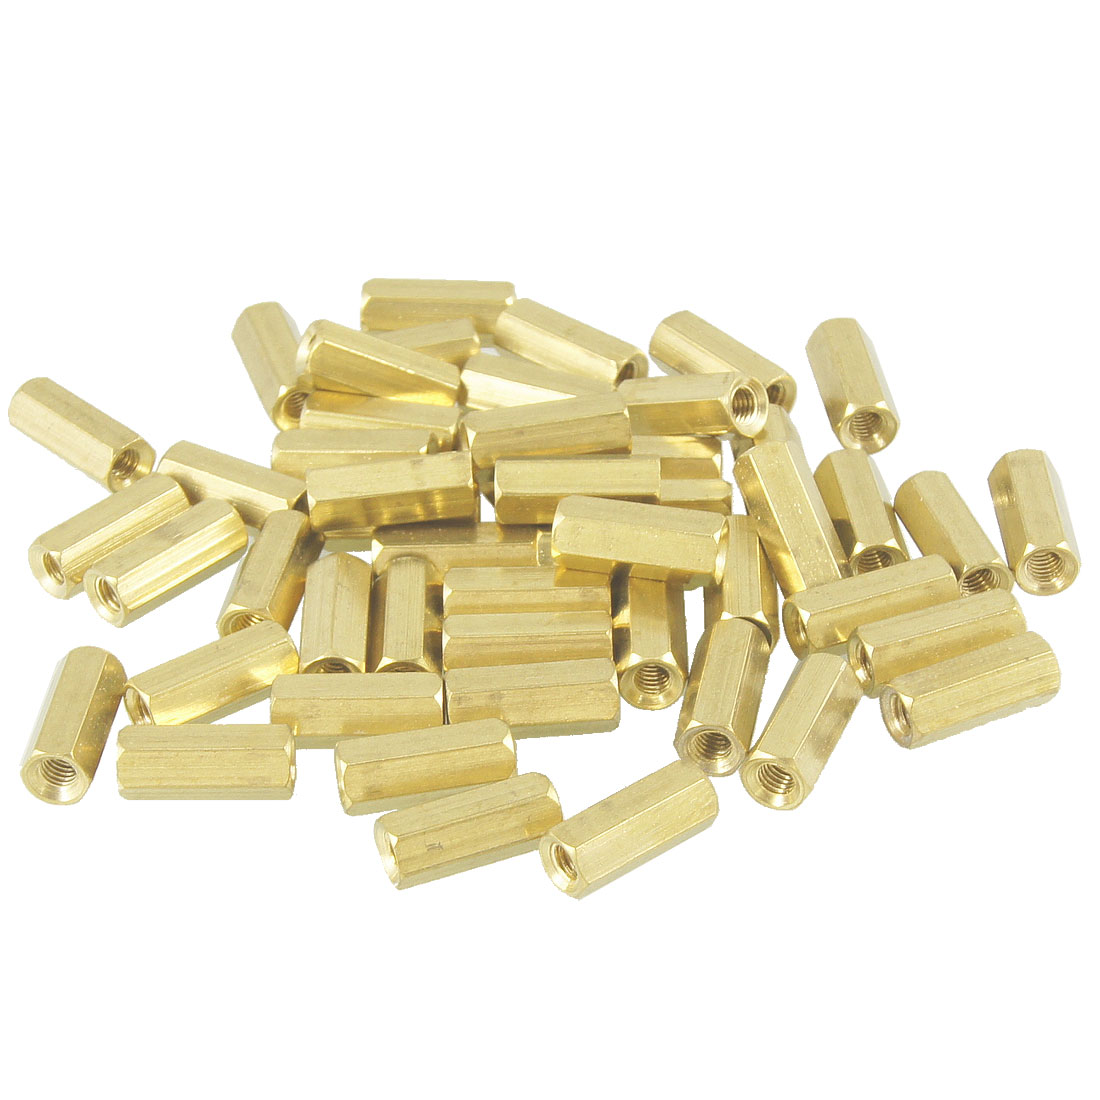 50 Pcs M3X13mm Gold Tone Female Thread Standoff Hexagonal Spacers